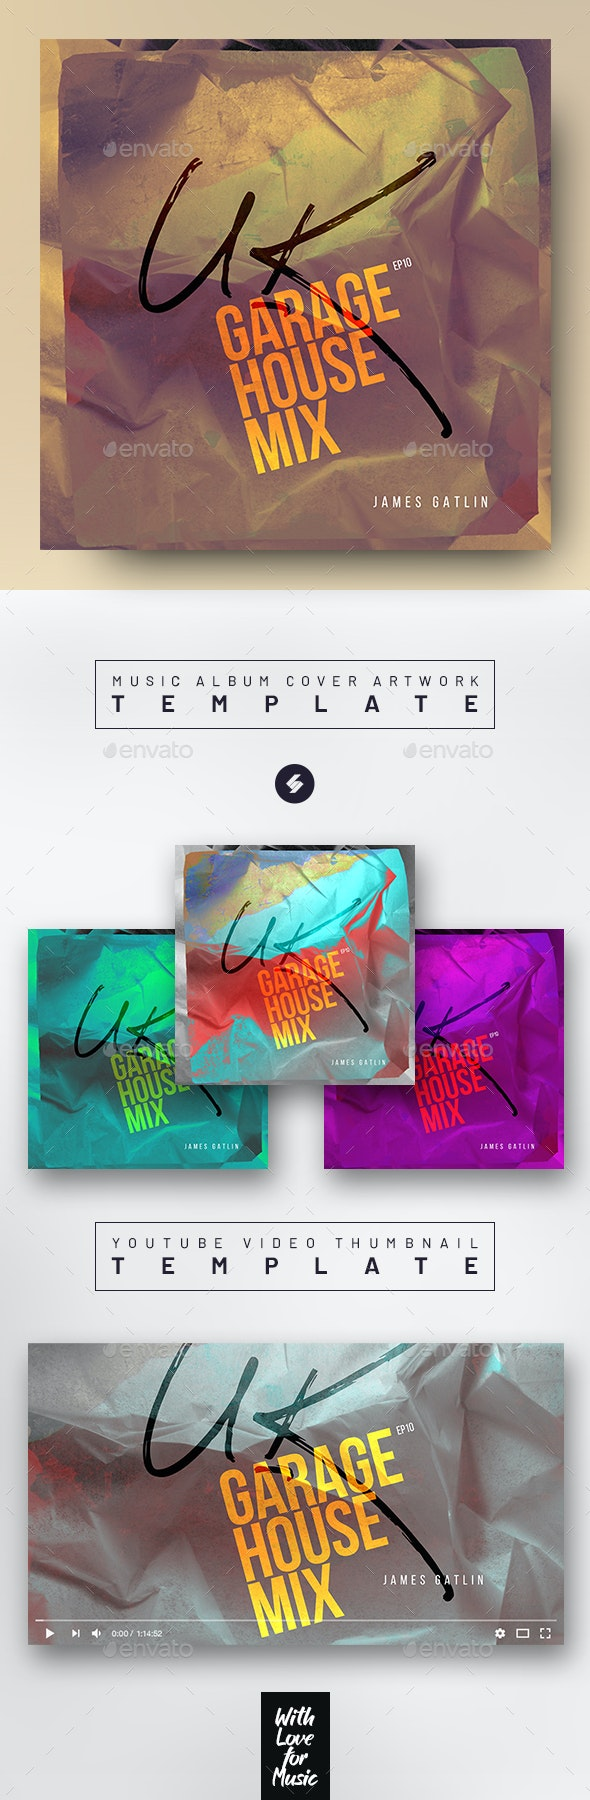 Garage House Music 10 – Album Cover Artwork Template - Miscellaneous Social Media